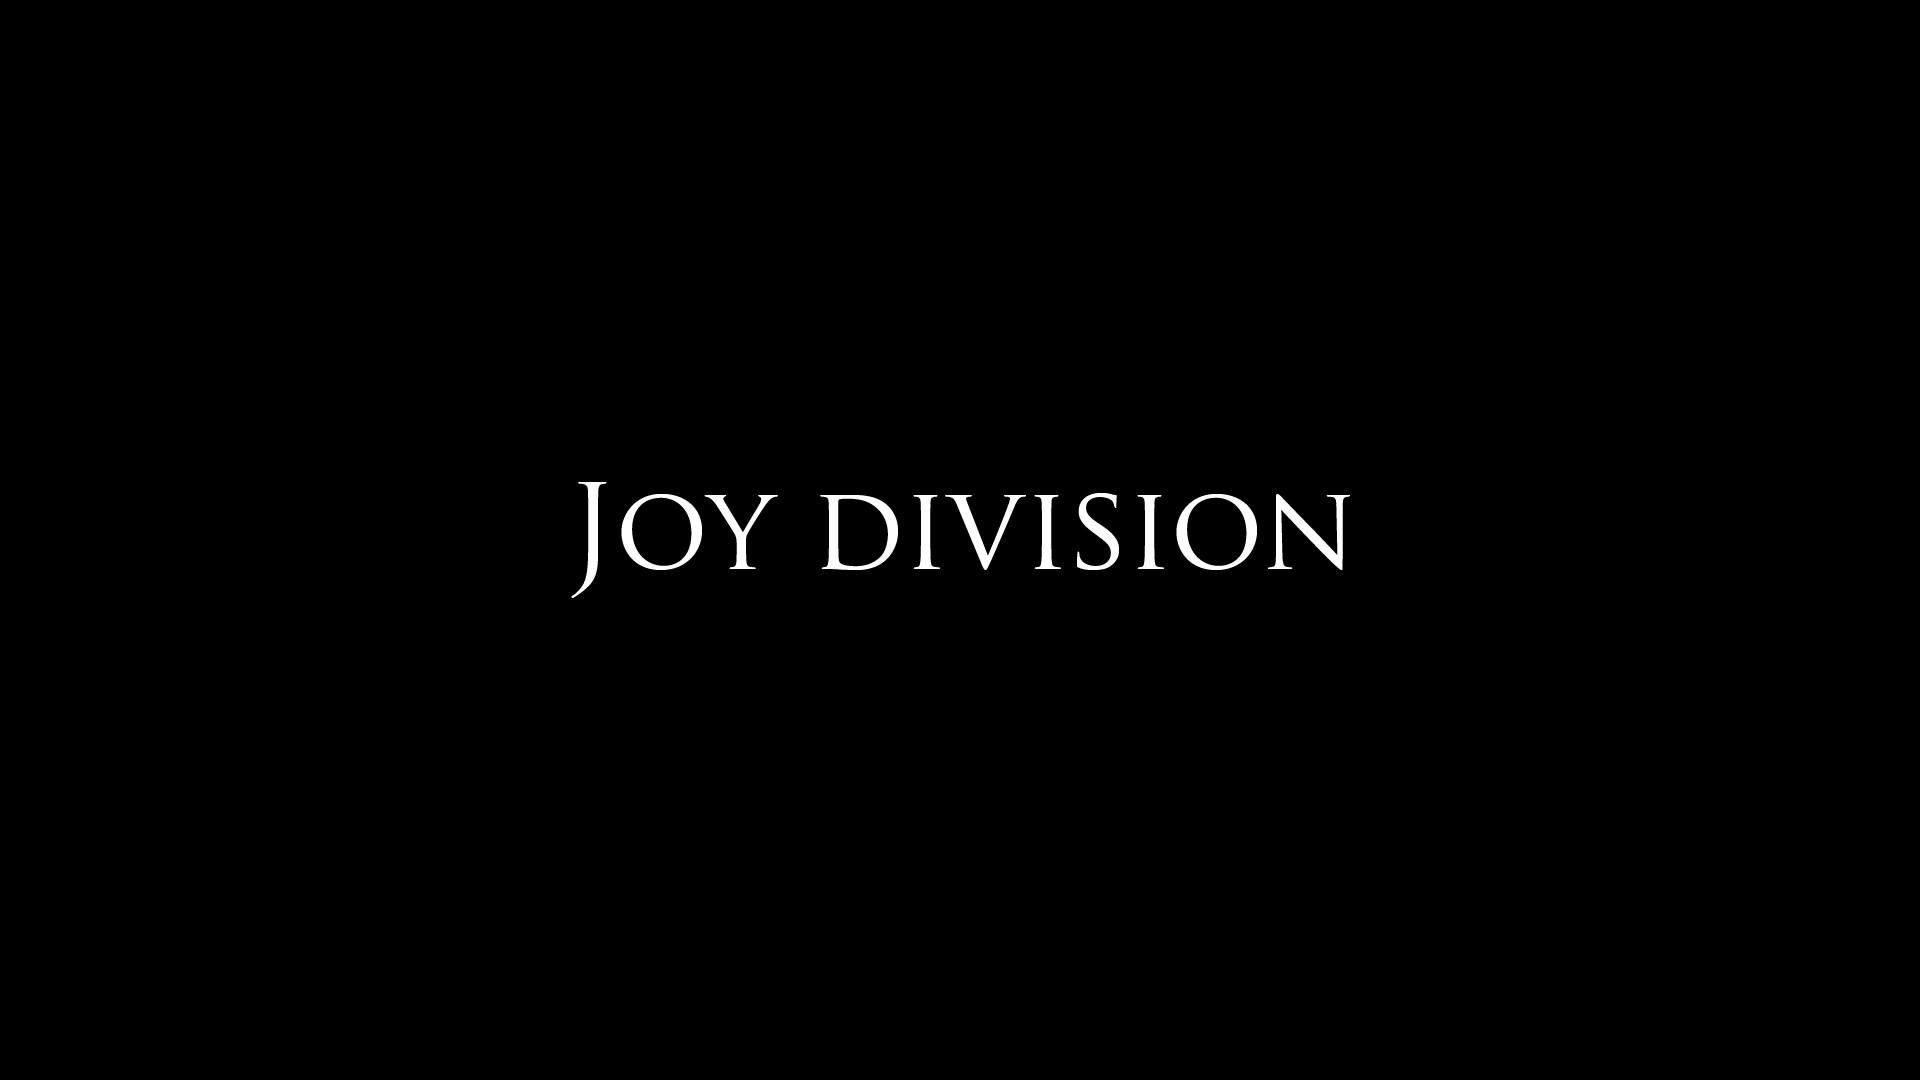 Joy Division Unknown Pleasures Phone Wallpaper Best Hd Wallpaper